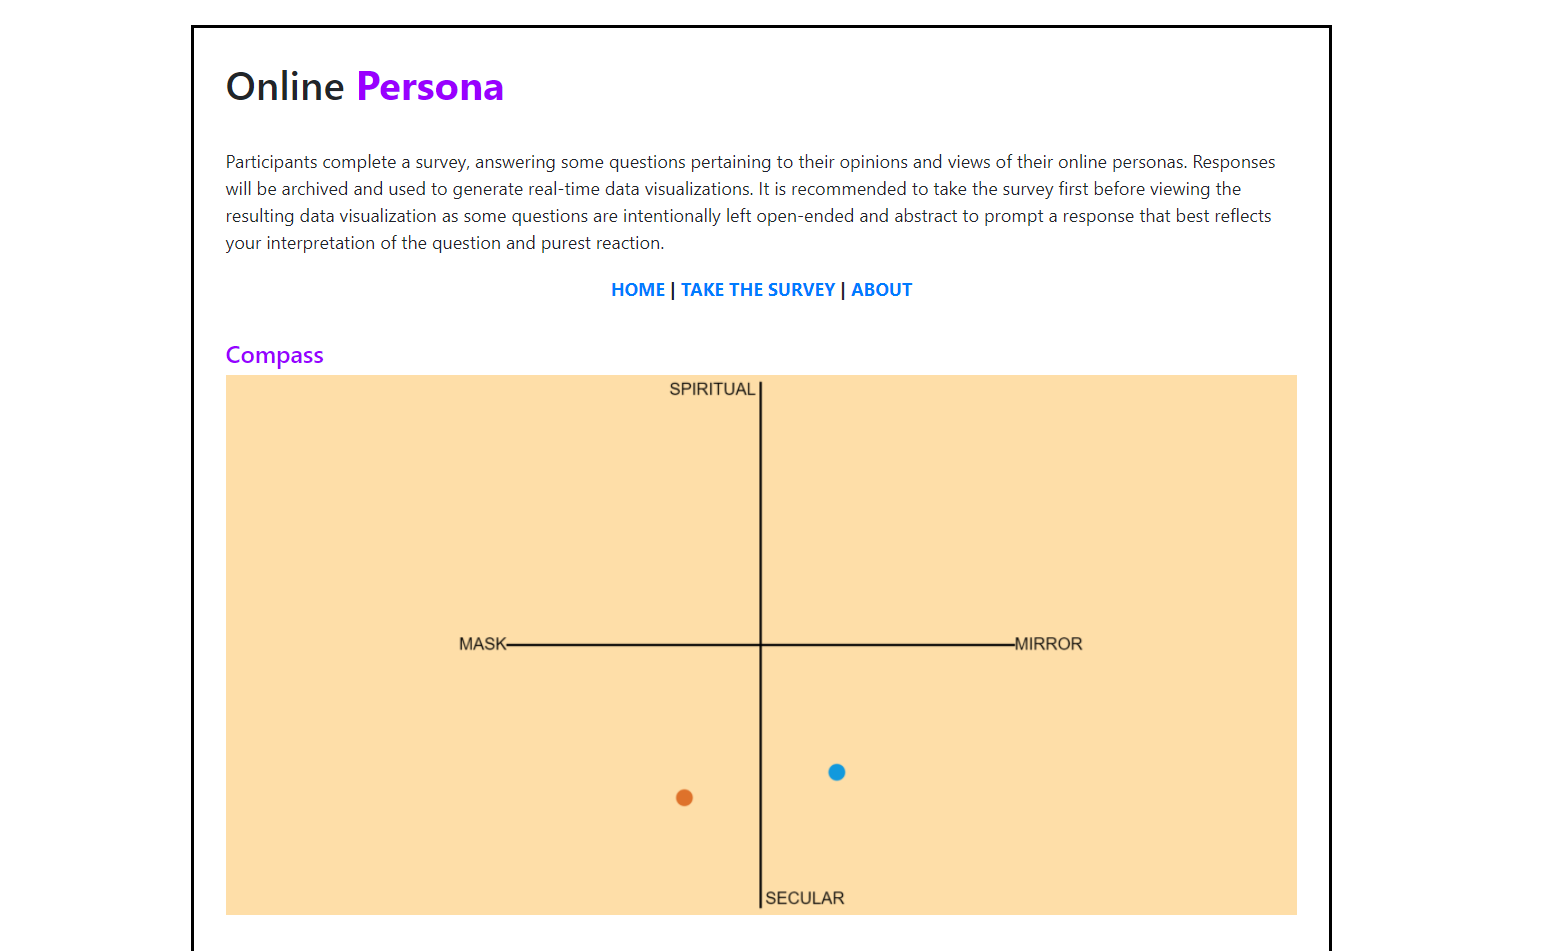 Online Persona Screenshot